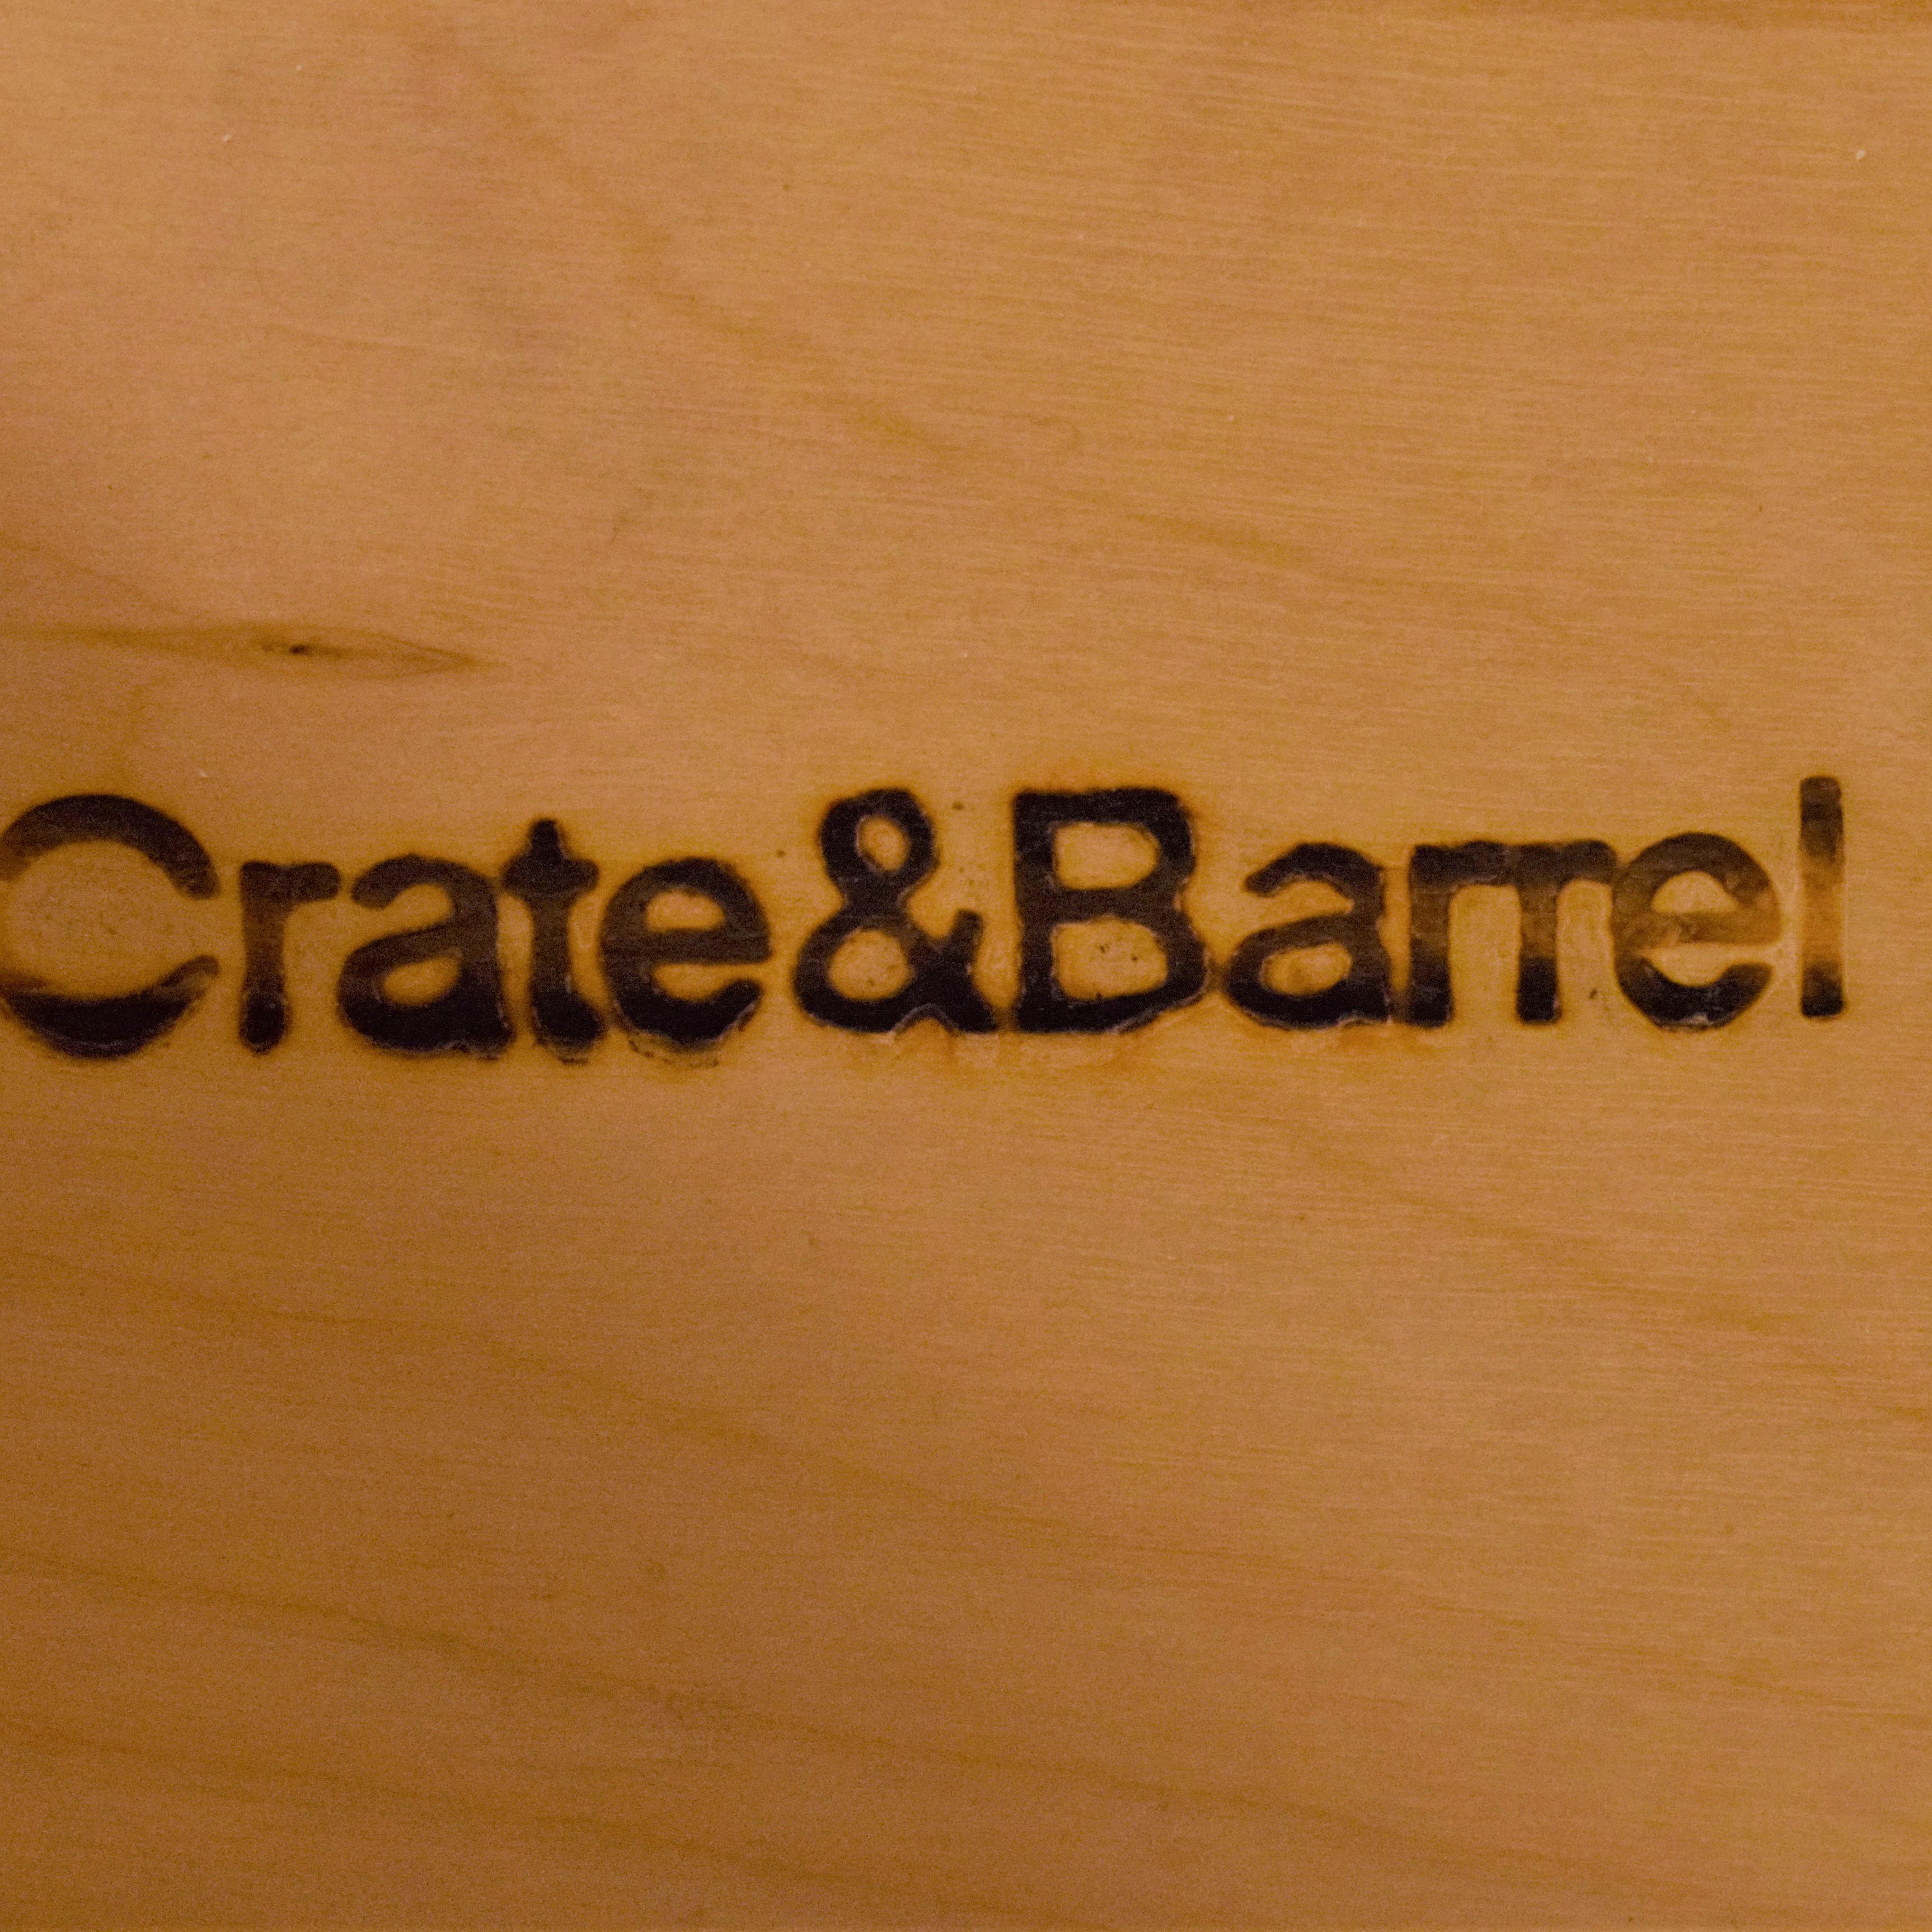 Crate & Barrel Crate & Barrel Bedroom Armoire for sale